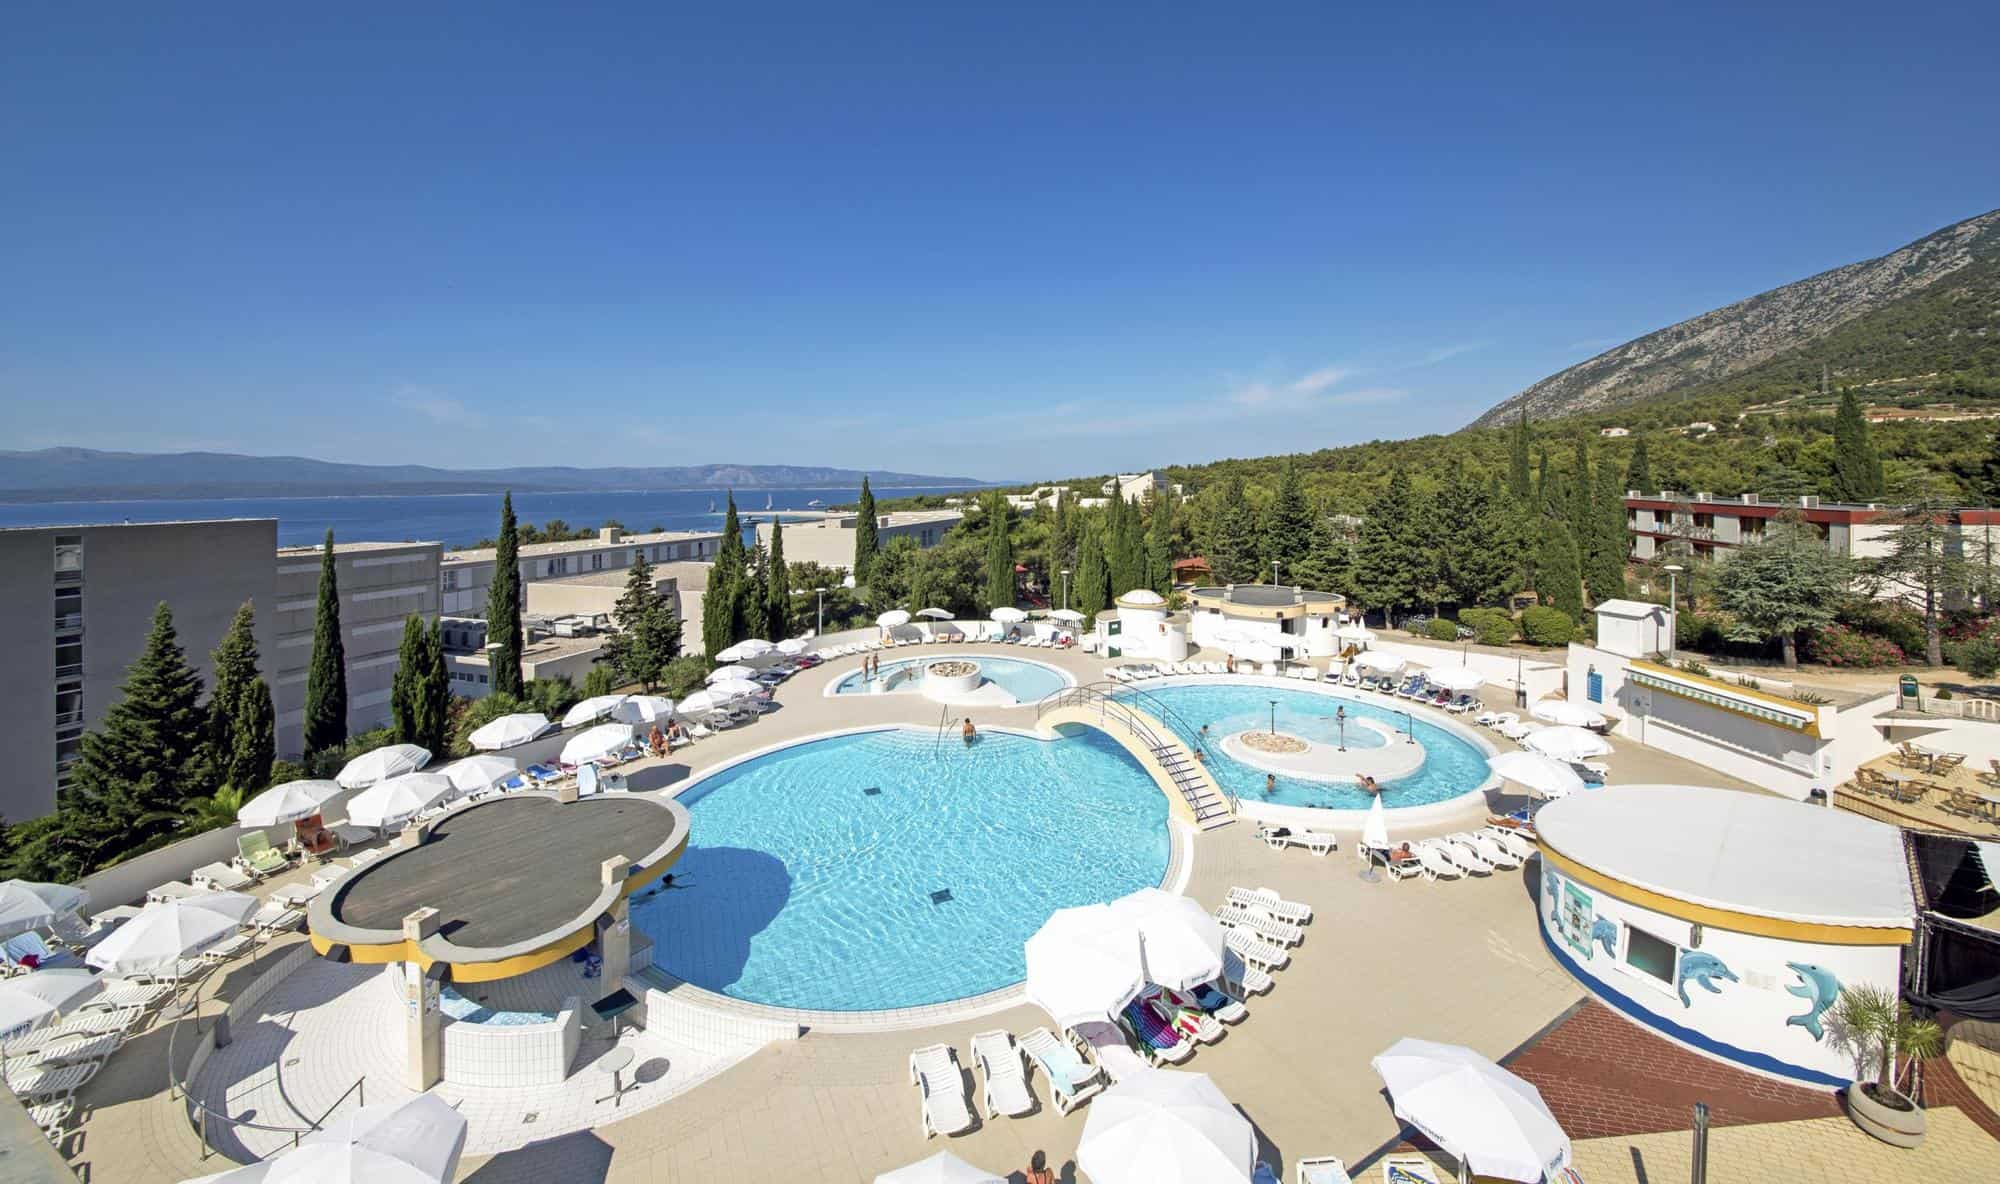 17 hotel bonaca swimming pool 1